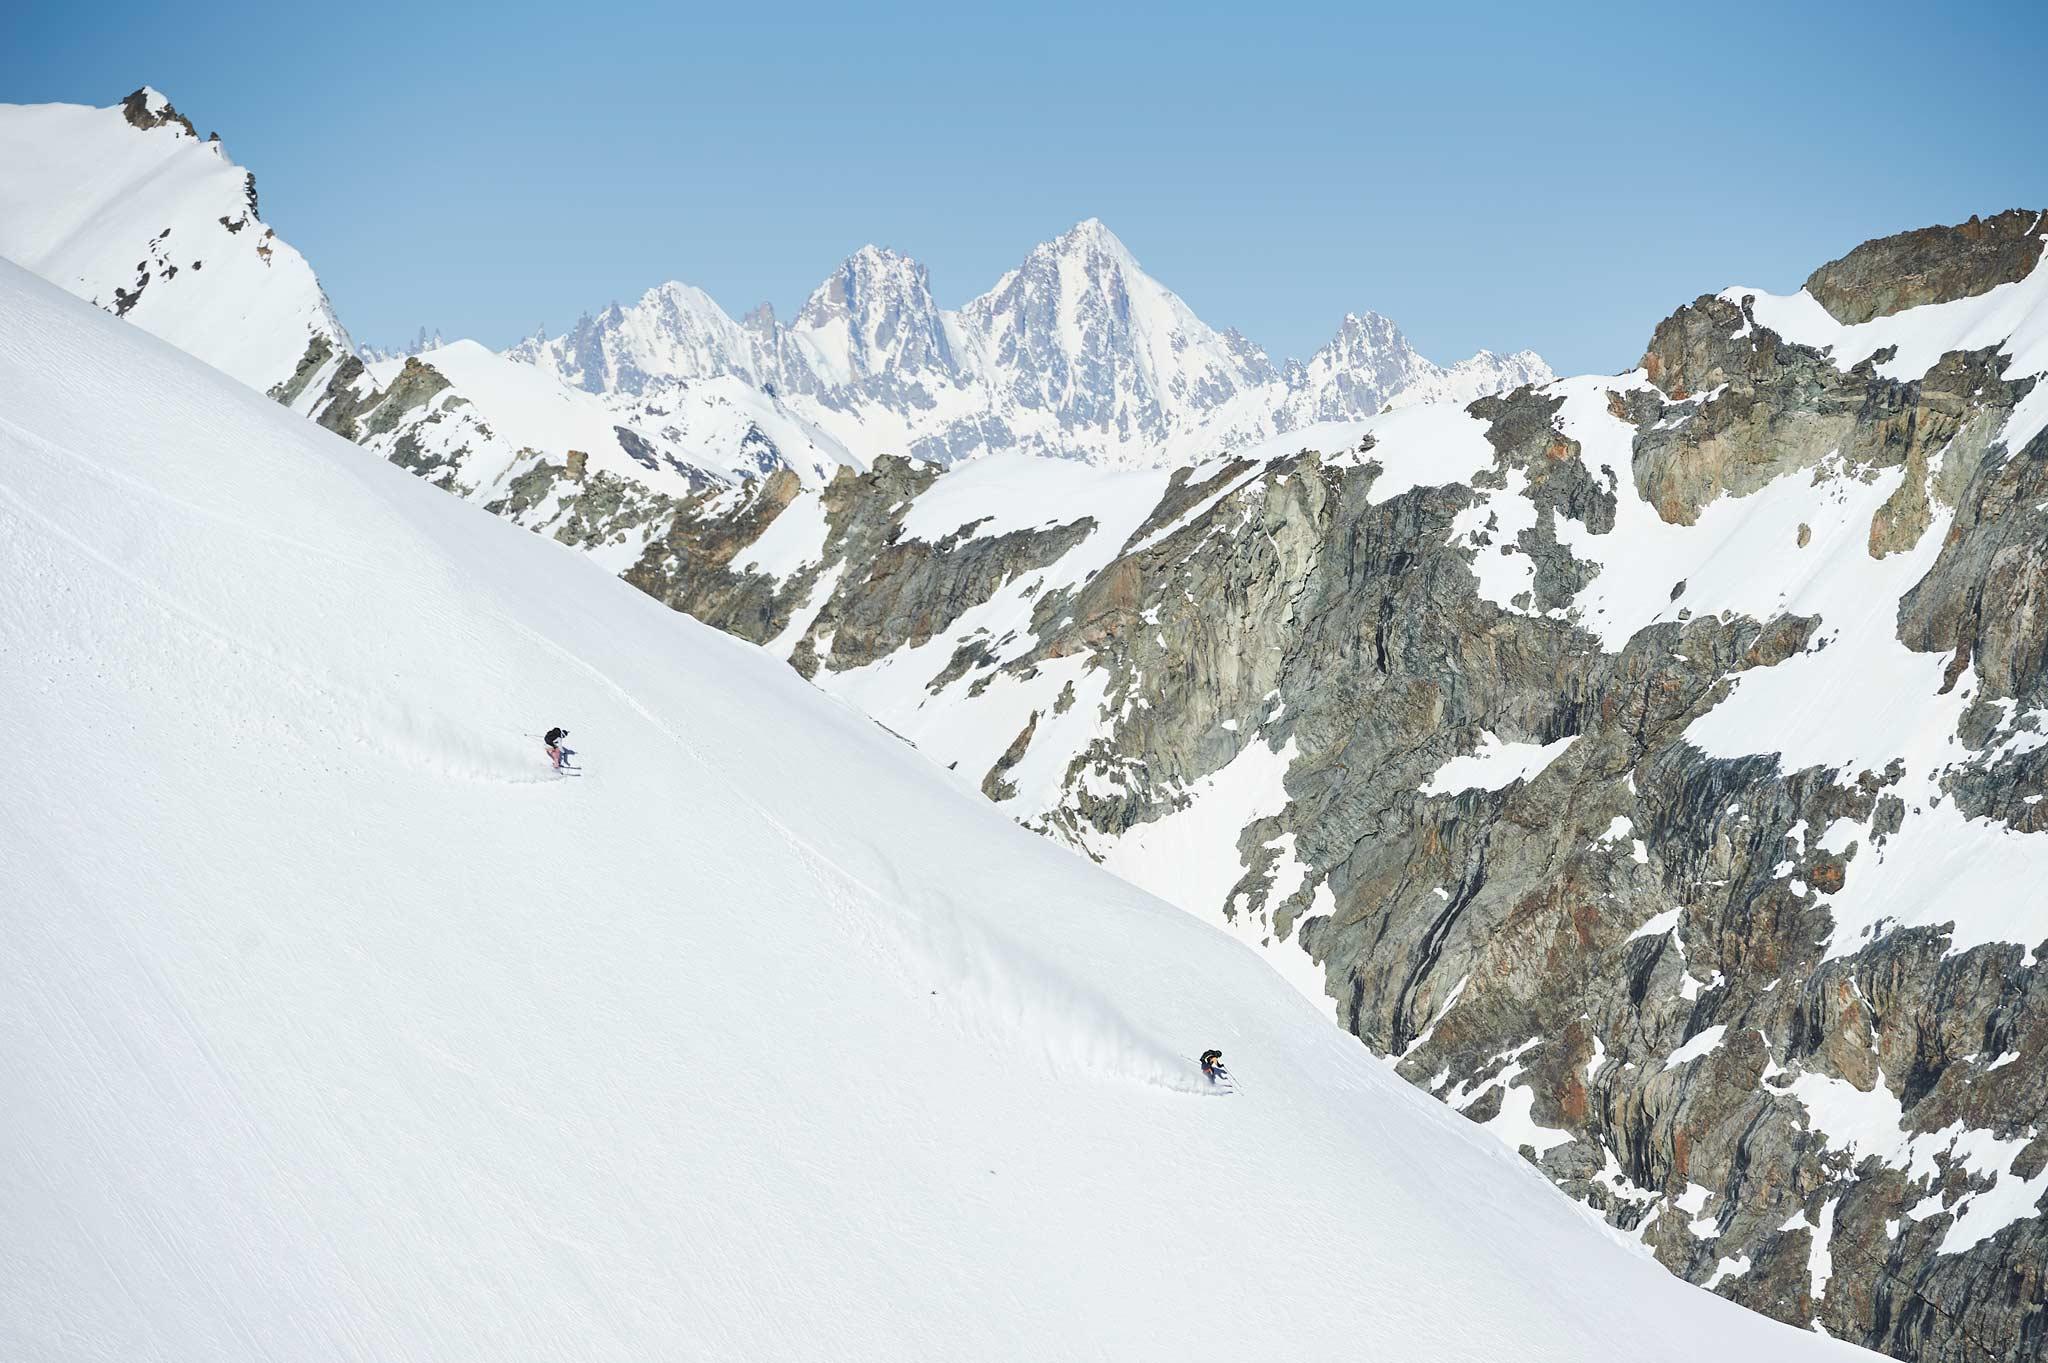 """Zermatt To Verbier"" Full Movie - 2020 - The Faction Collective"